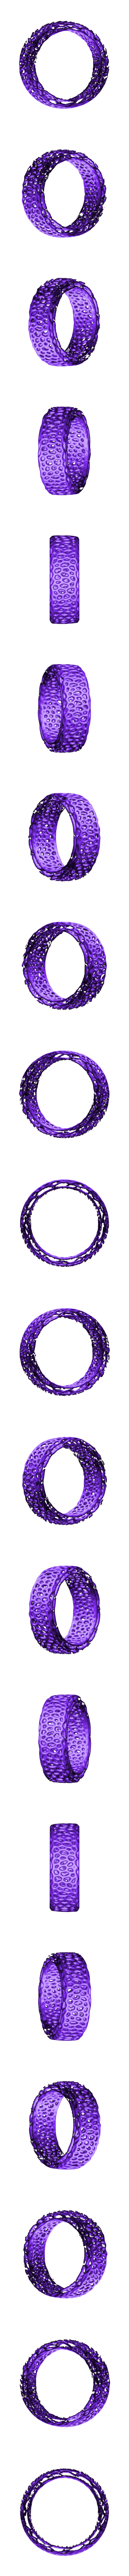 bracelet voro big.stl Download free STL file Bracelet Voro • 3D printer object, SamVoro